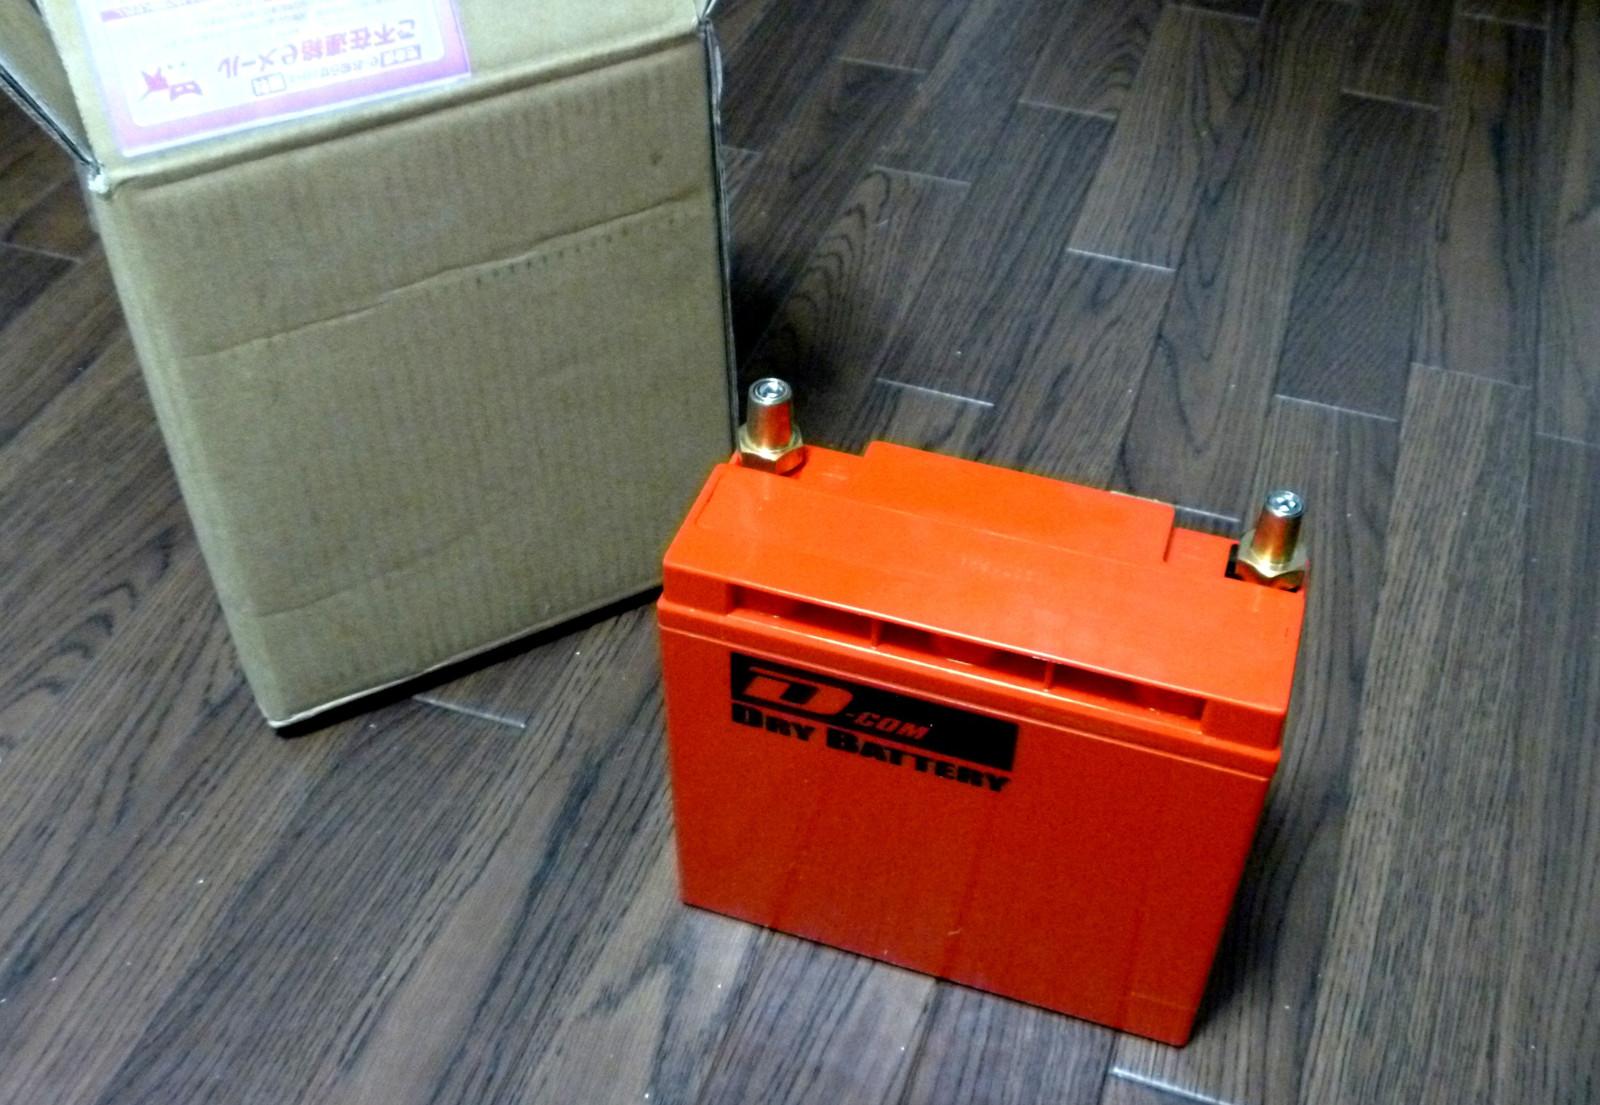 Drybattery